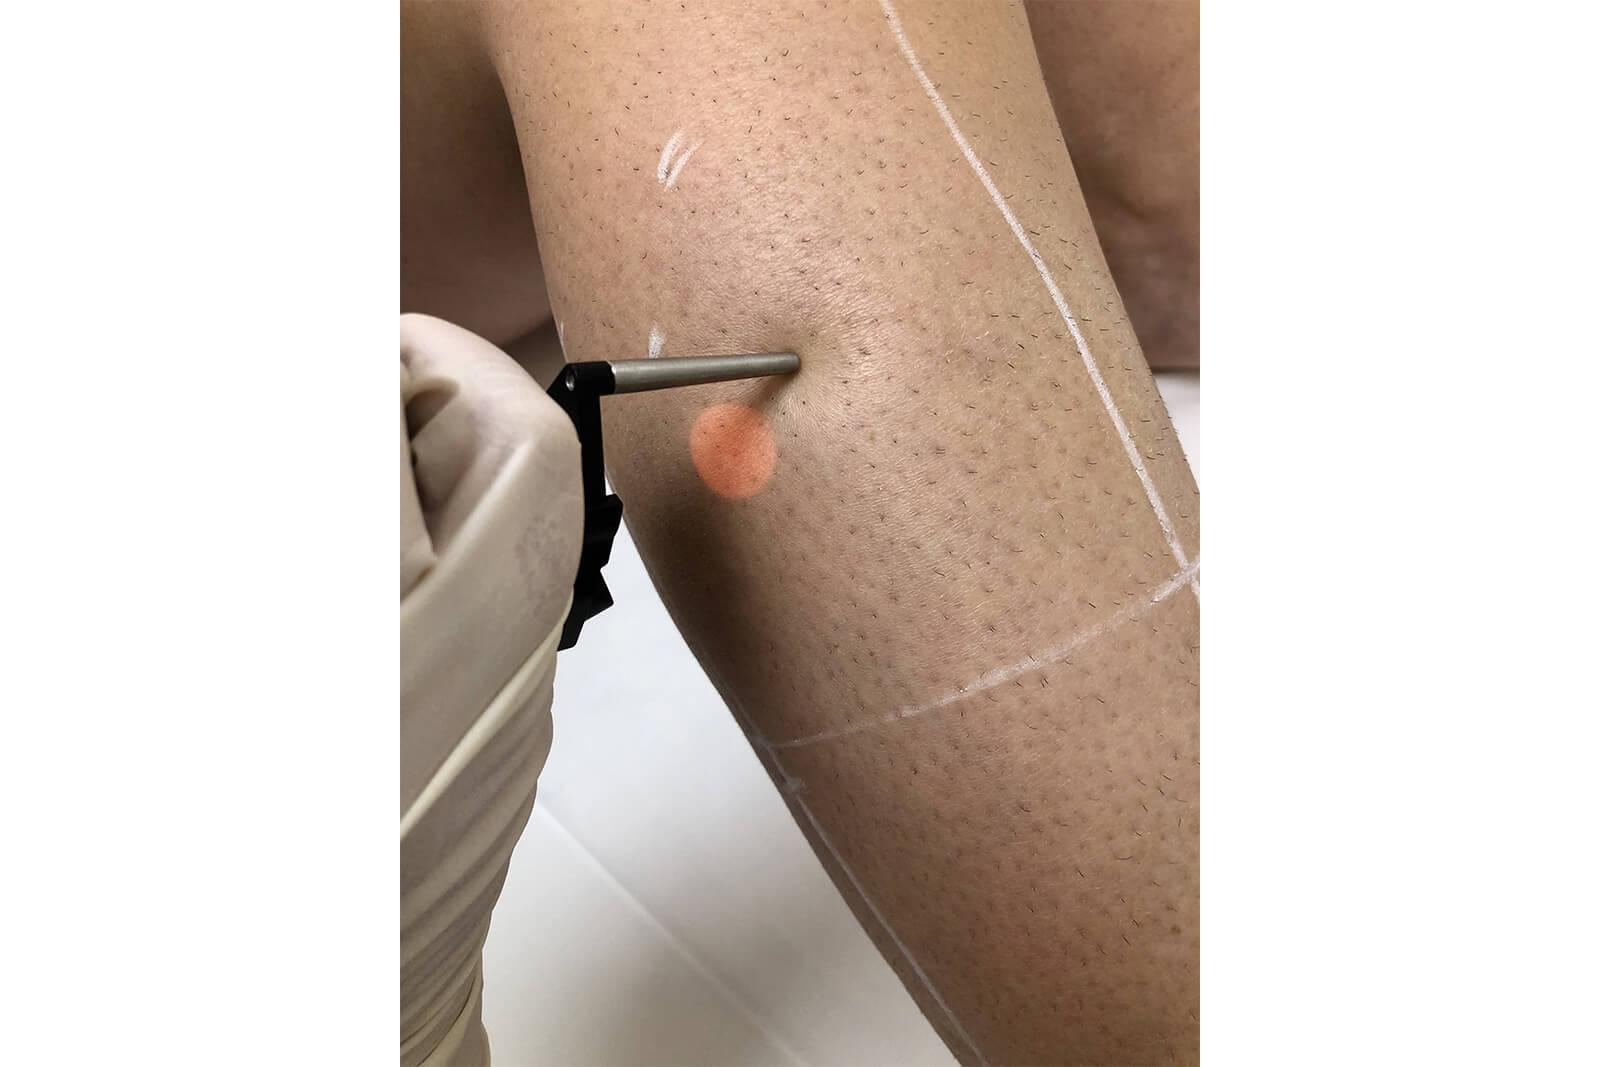 laser depilatoire 5